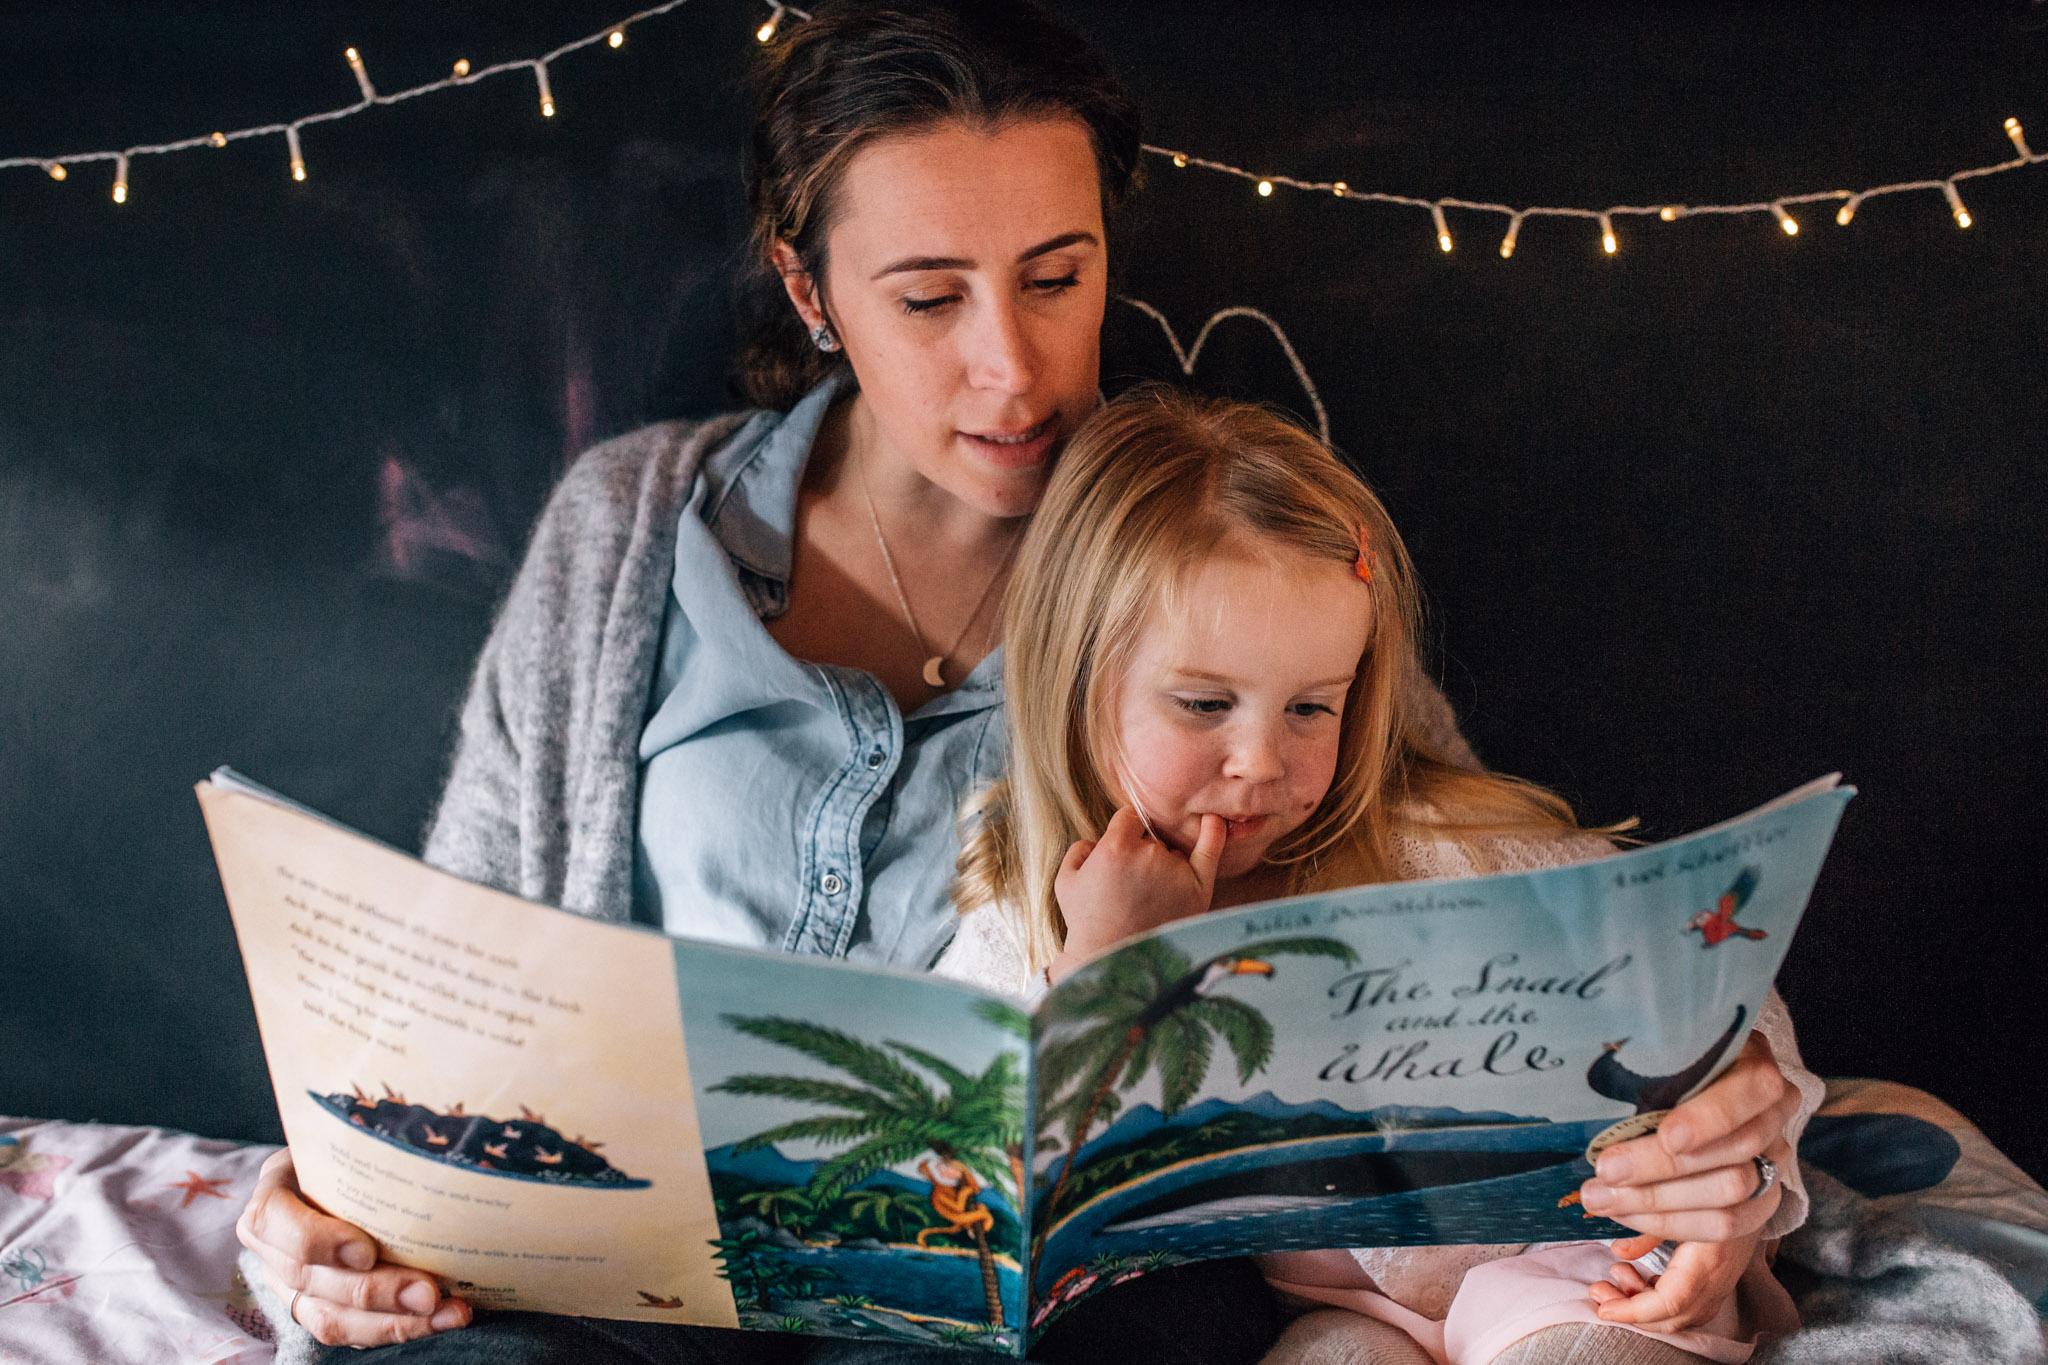 Mum and daughter reading.